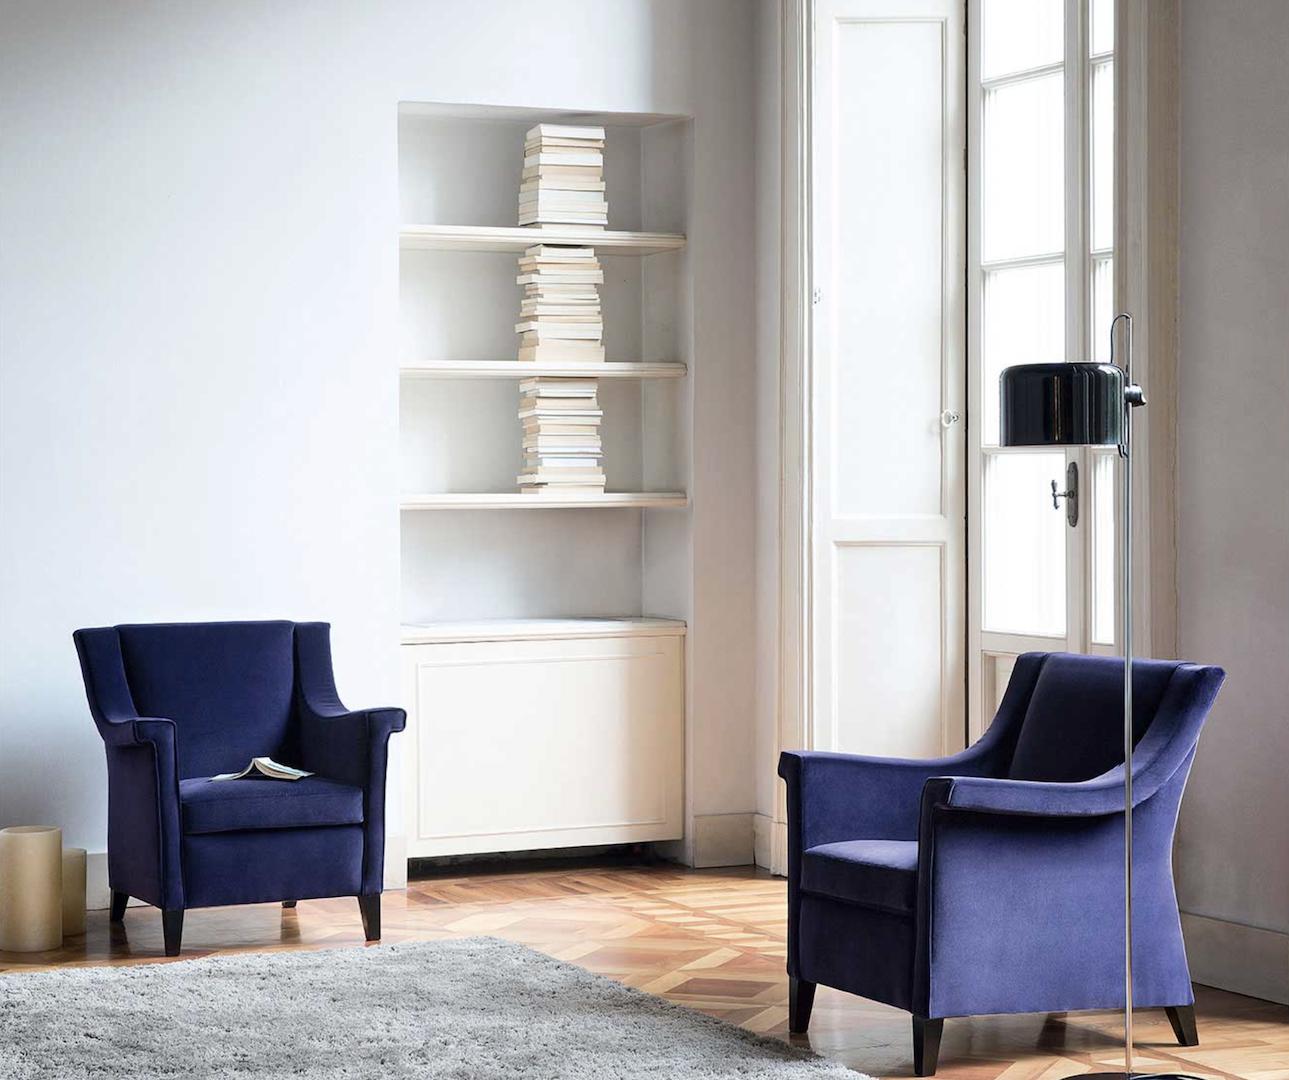 AMC 117 Italian Designer Lounge Chairs